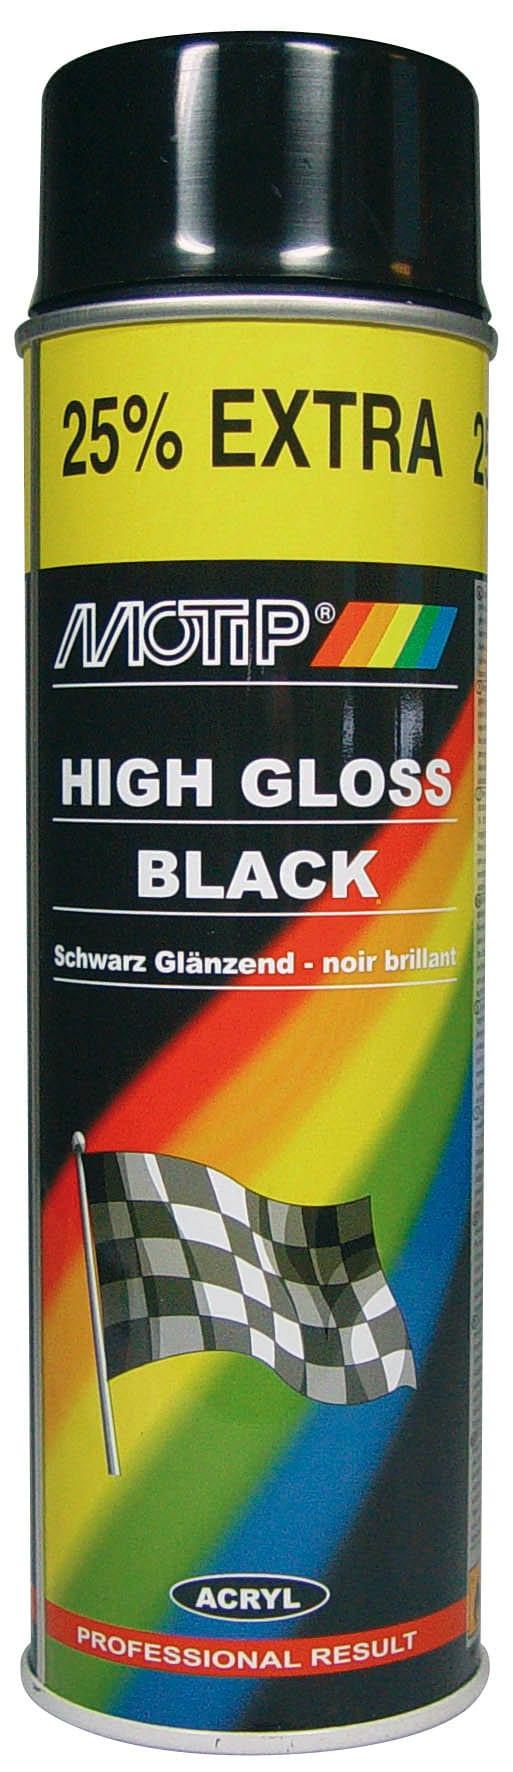 MOTIP High Gloss Black 500 ml Peinture aérosol | Migros